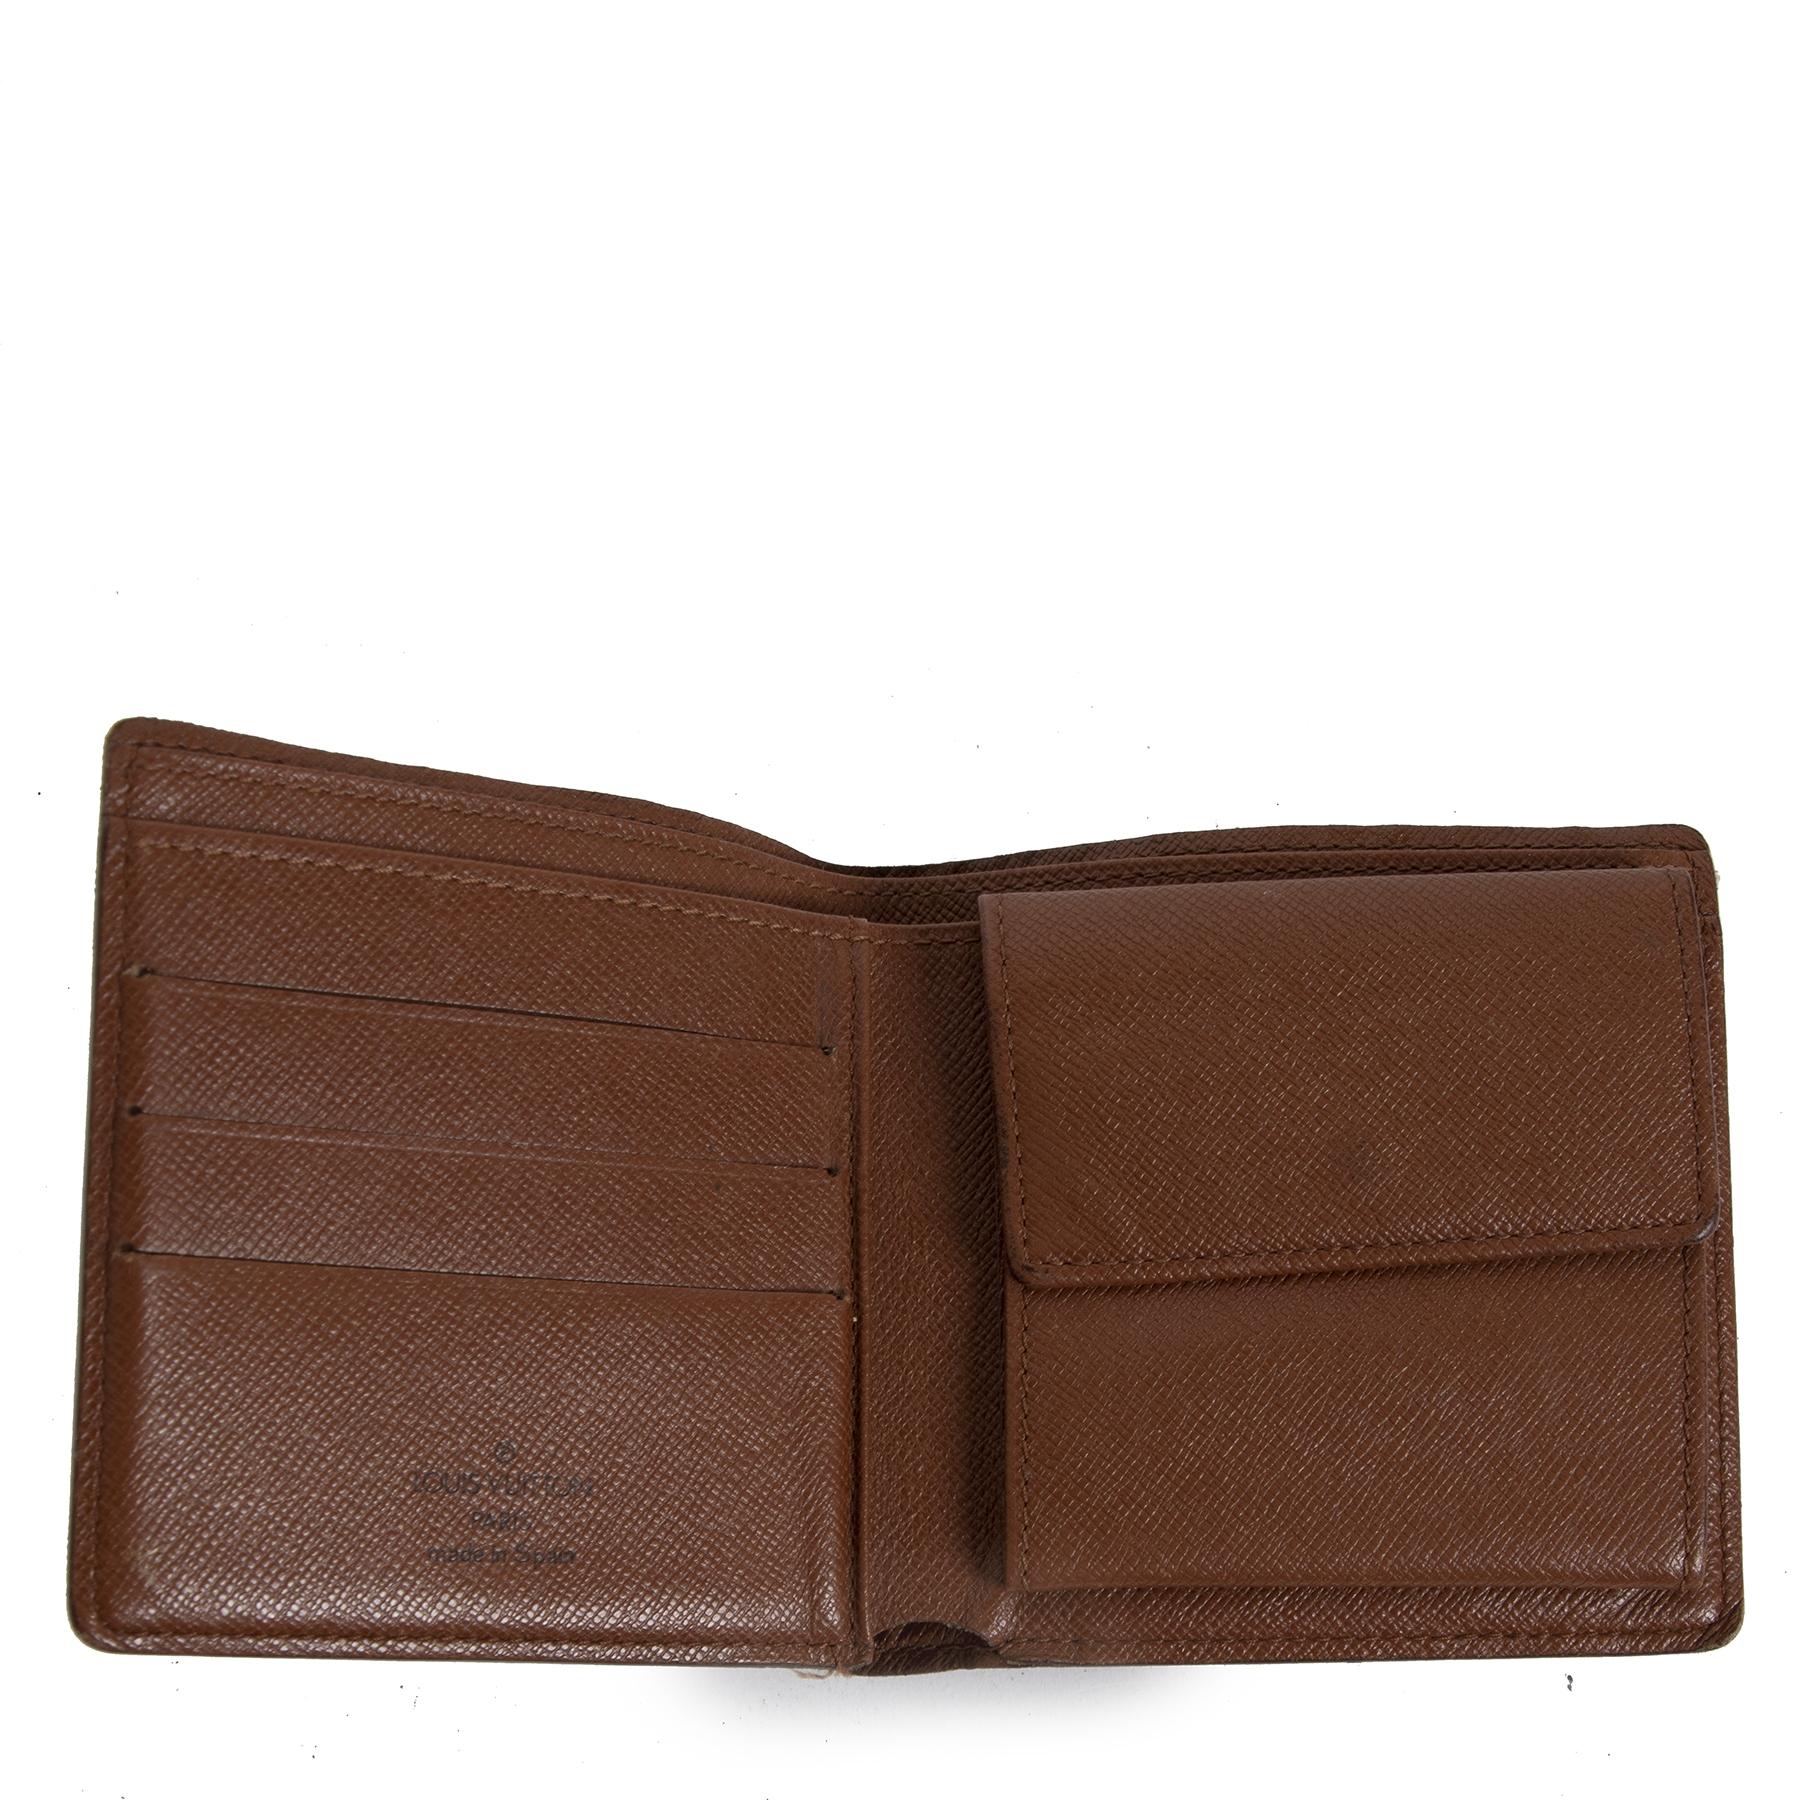 Authentieke tweedehands vintage Louis Vuitton Monogram Multiple Wallet koop online webshop LabelLOV